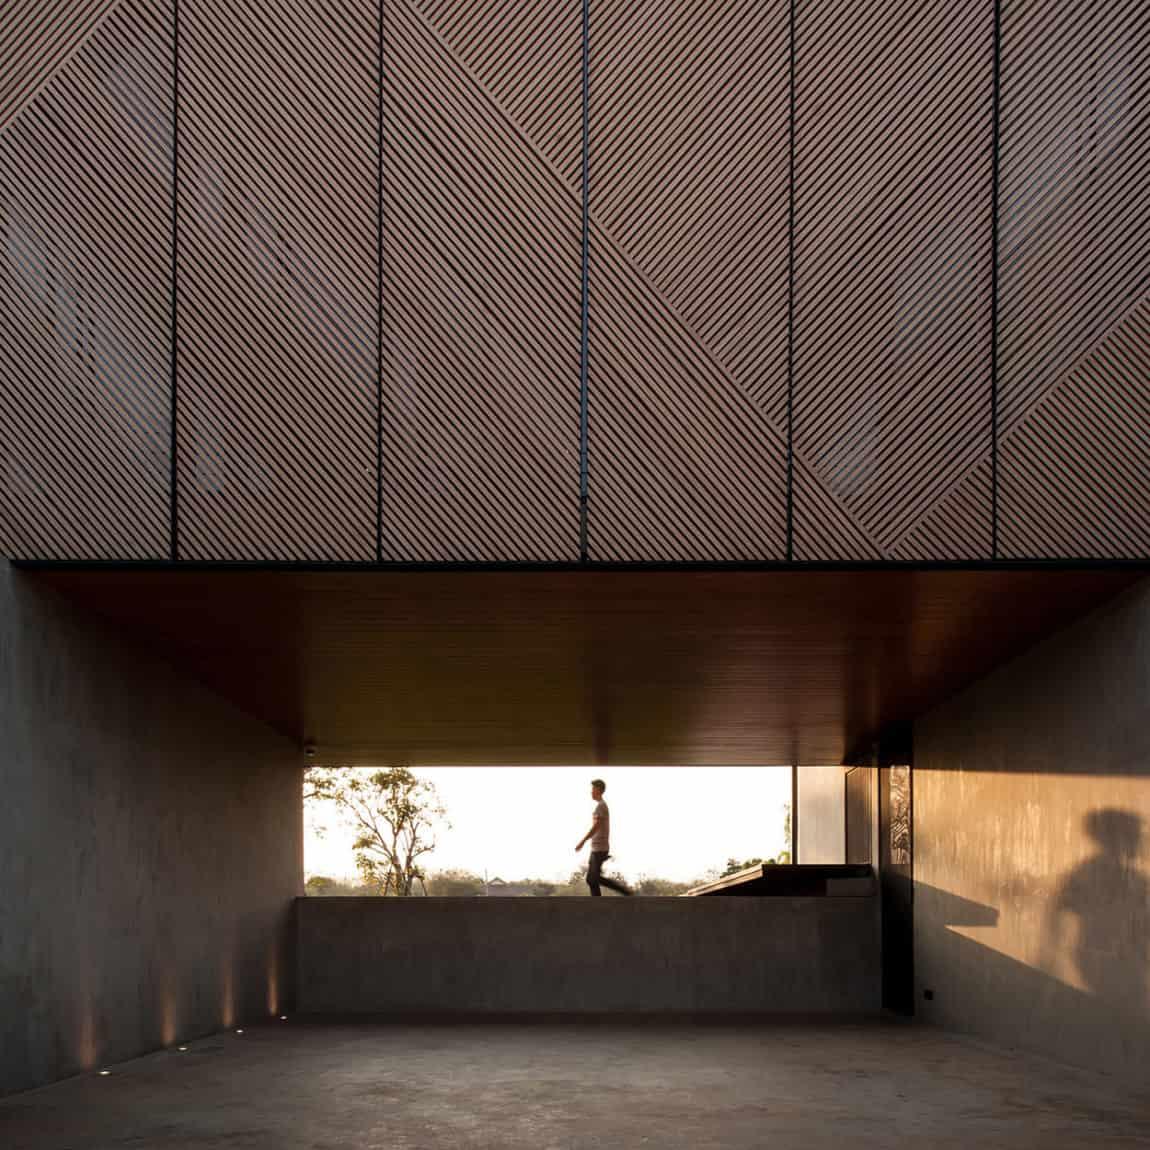 KA House by IDIN Architects (5)